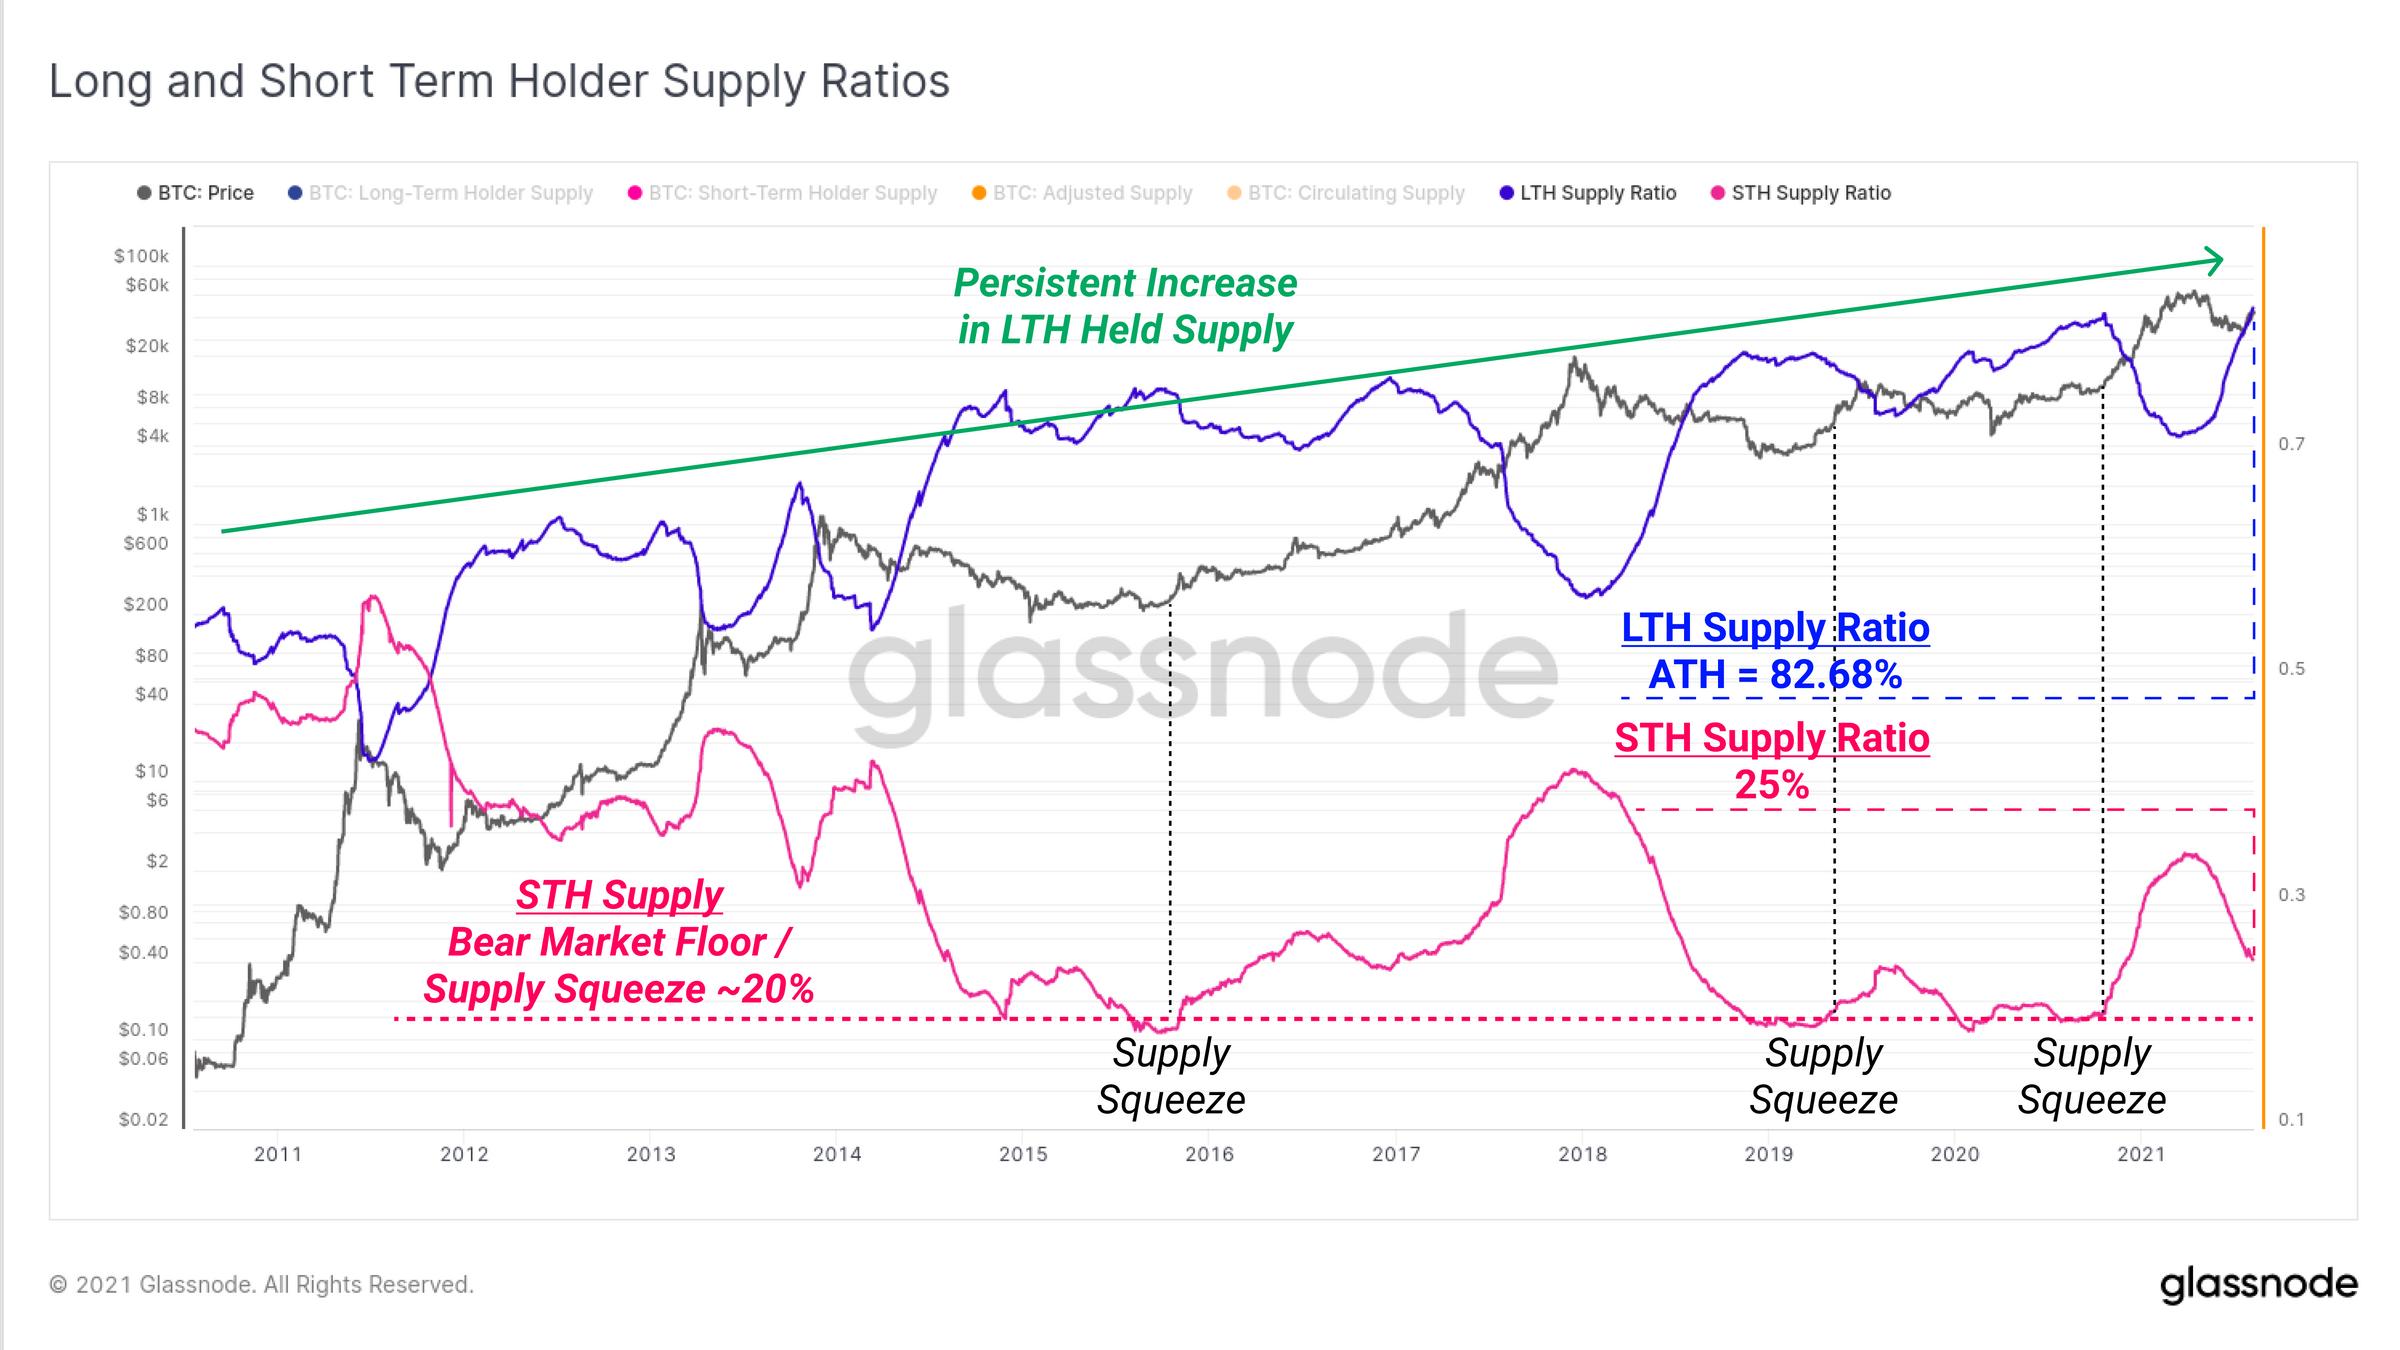 Long and Short Term Holder Supply Ratios di Bitcoin